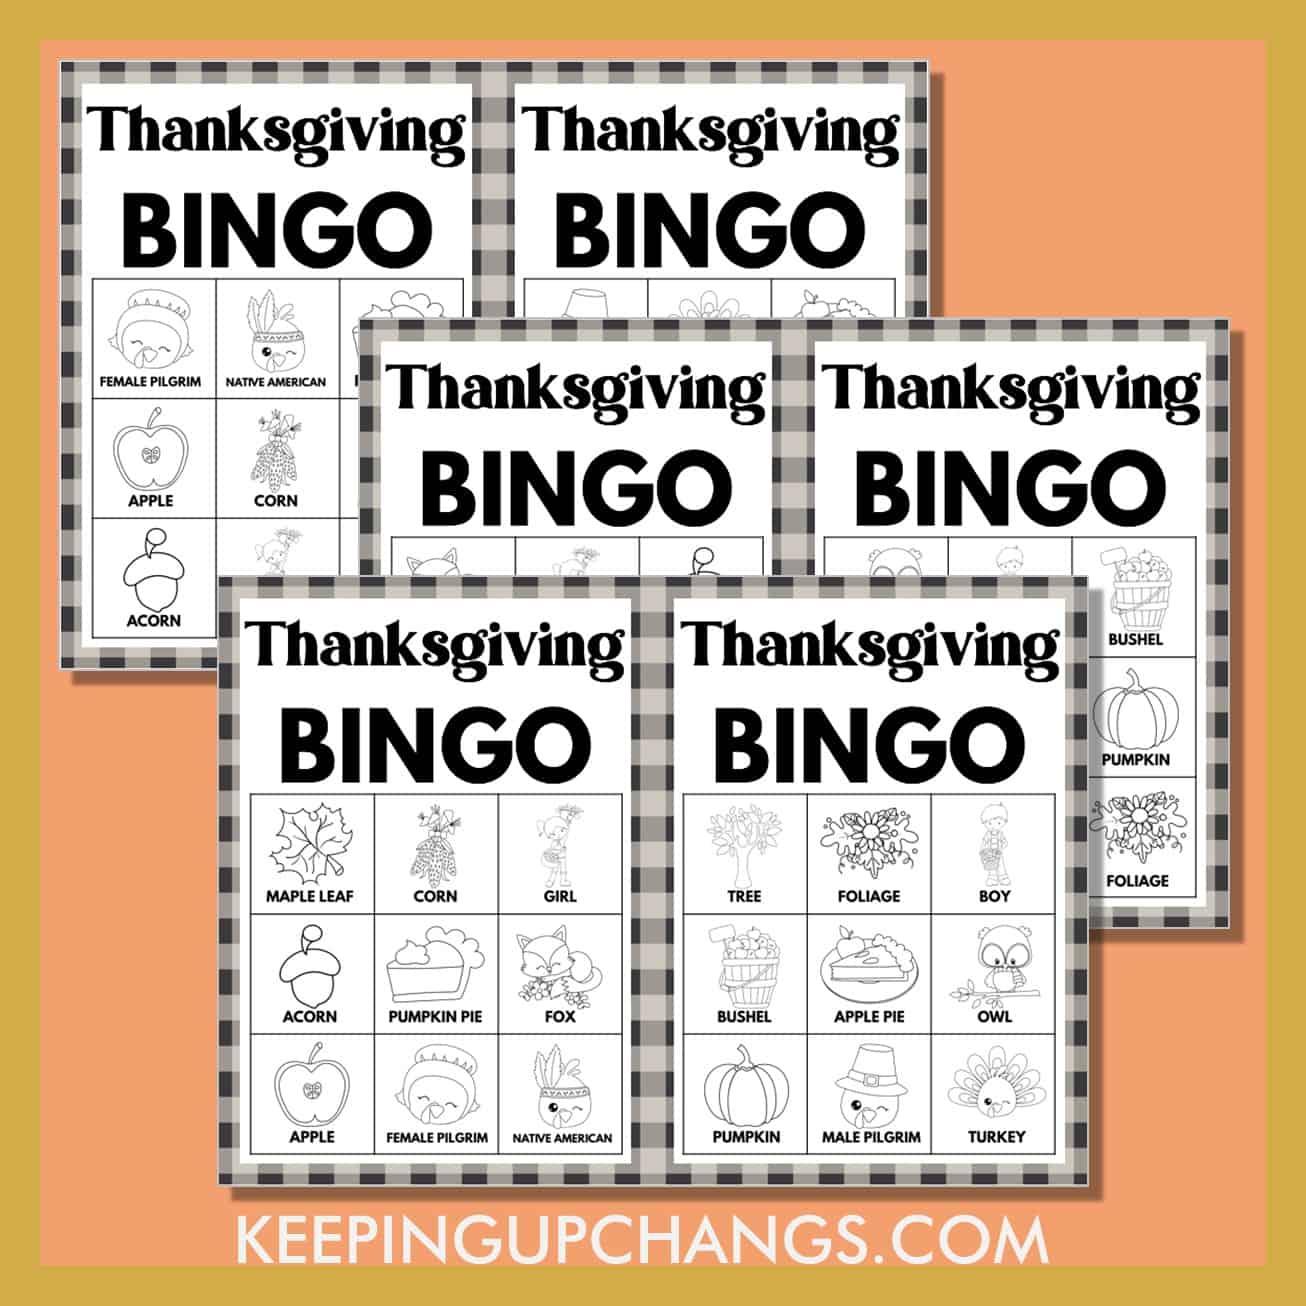 free fall thanksgiving bingo 3x3 black white coloring game cards.